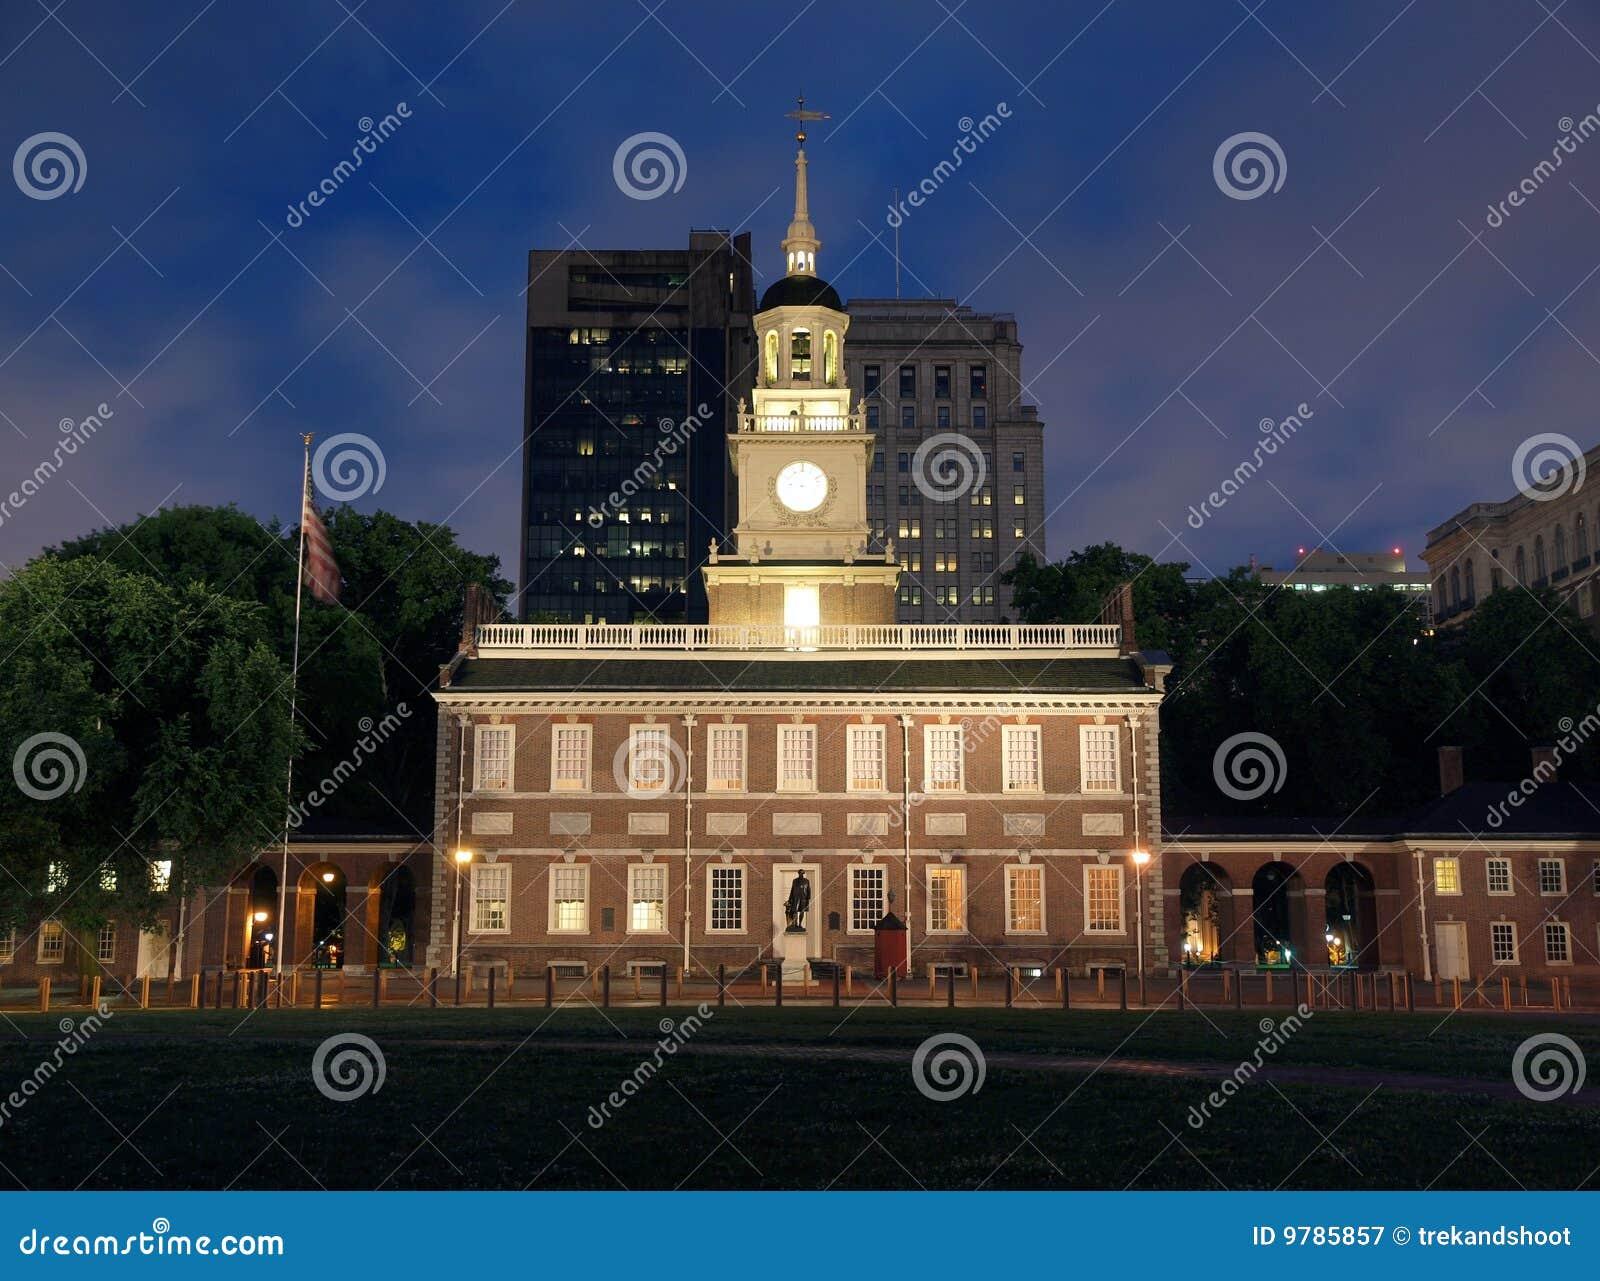 Independence Hall Night